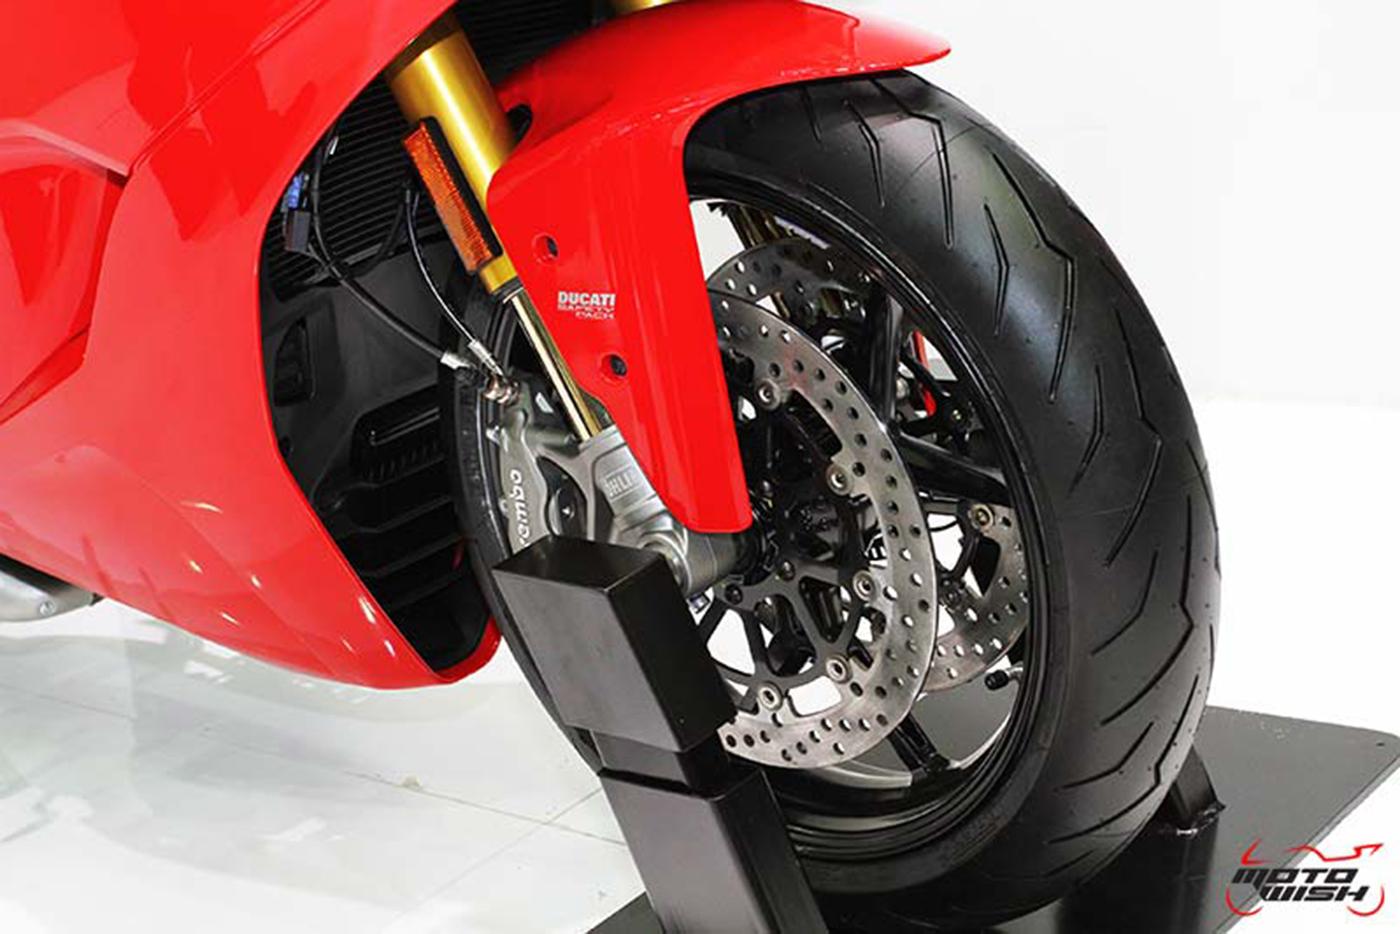 Ducati SuperSport 2017 – Đối thủ Kawasaki Ninja 1000 sắp về Việt Nam - ảnh 4